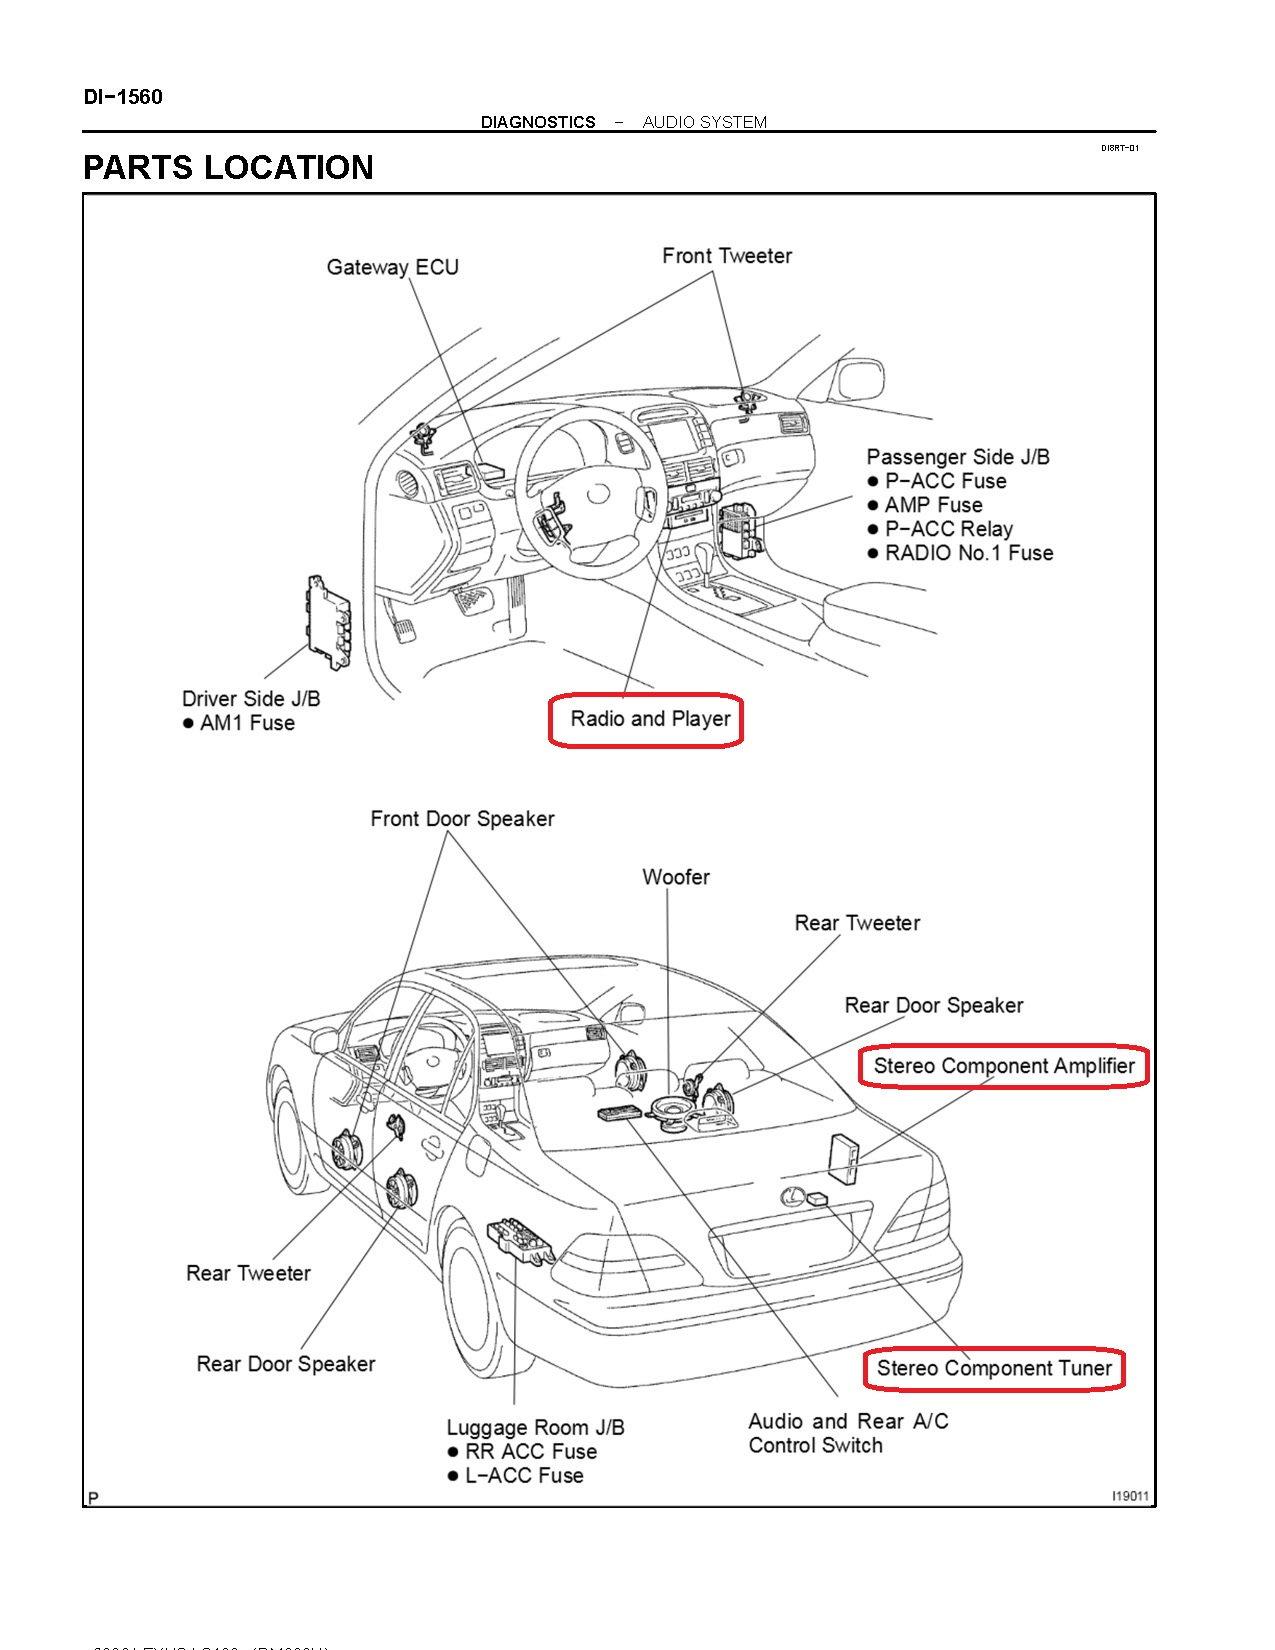 hight resolution of 2002 lexus ls 430 wiring harness diagram wiring library2002 lexus ls 430 wiring harness diagram